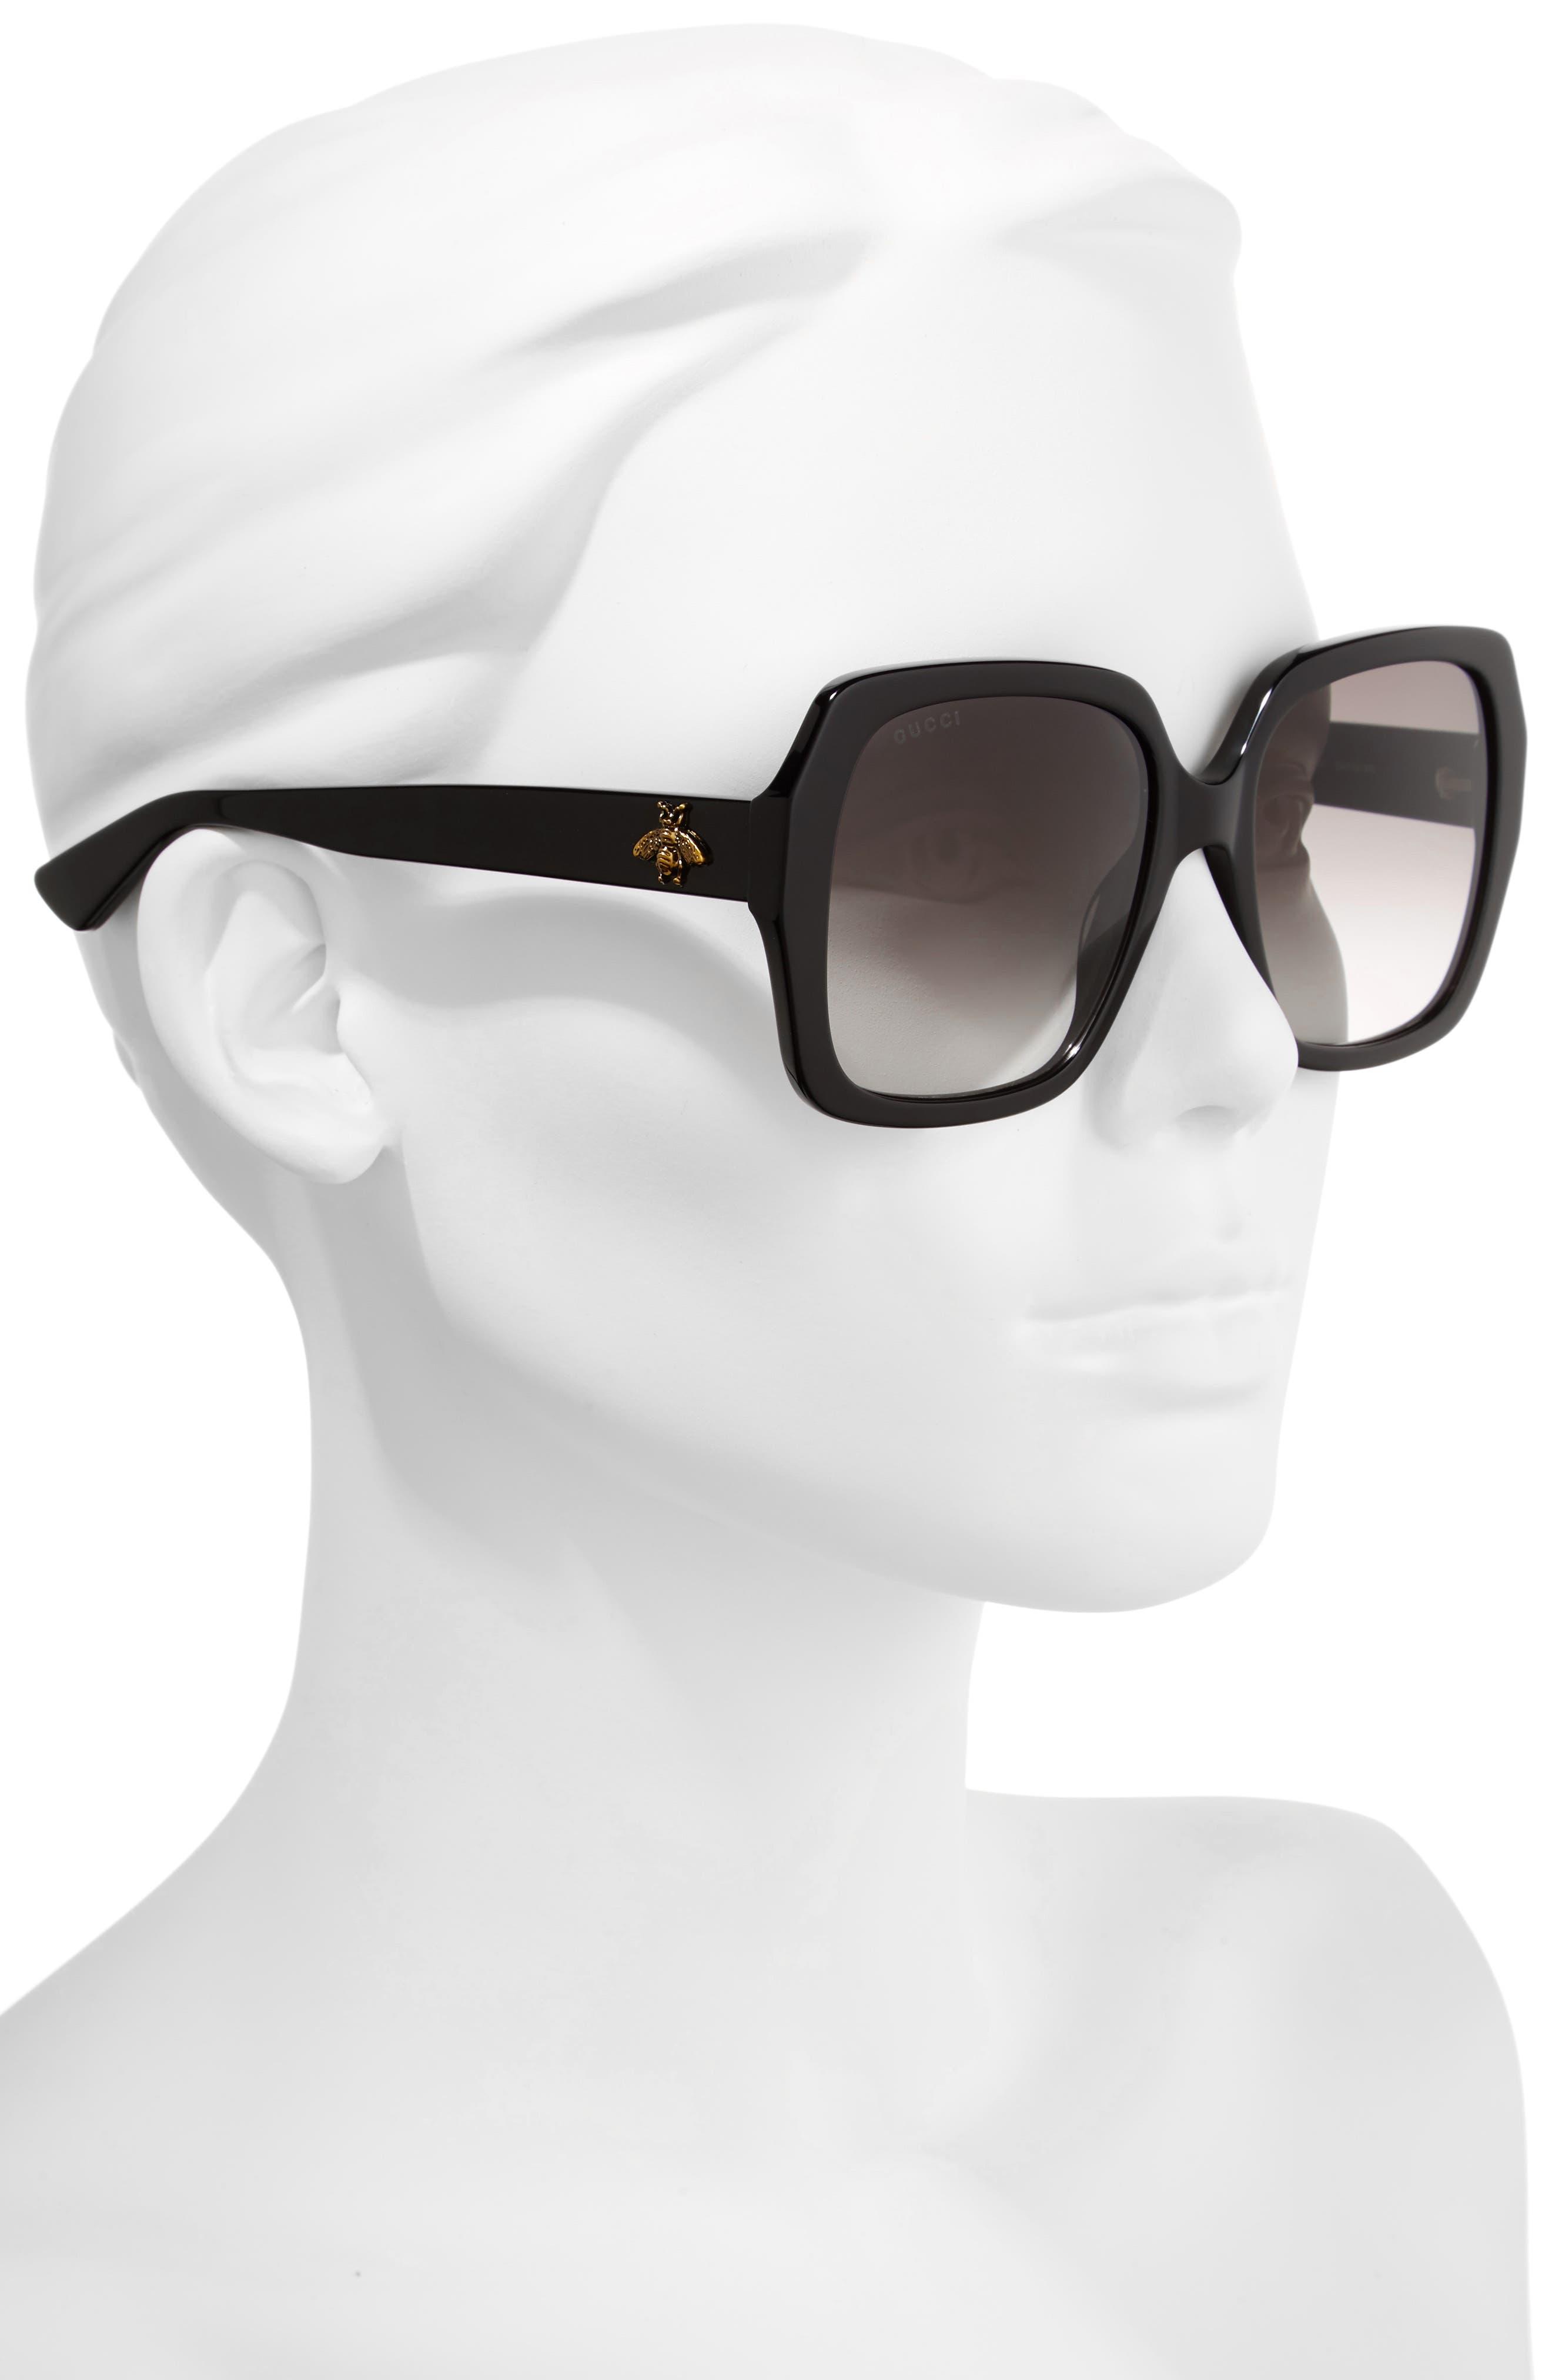 54mm Gradient Square Sunglasses,                             Alternate thumbnail 2, color,                             001